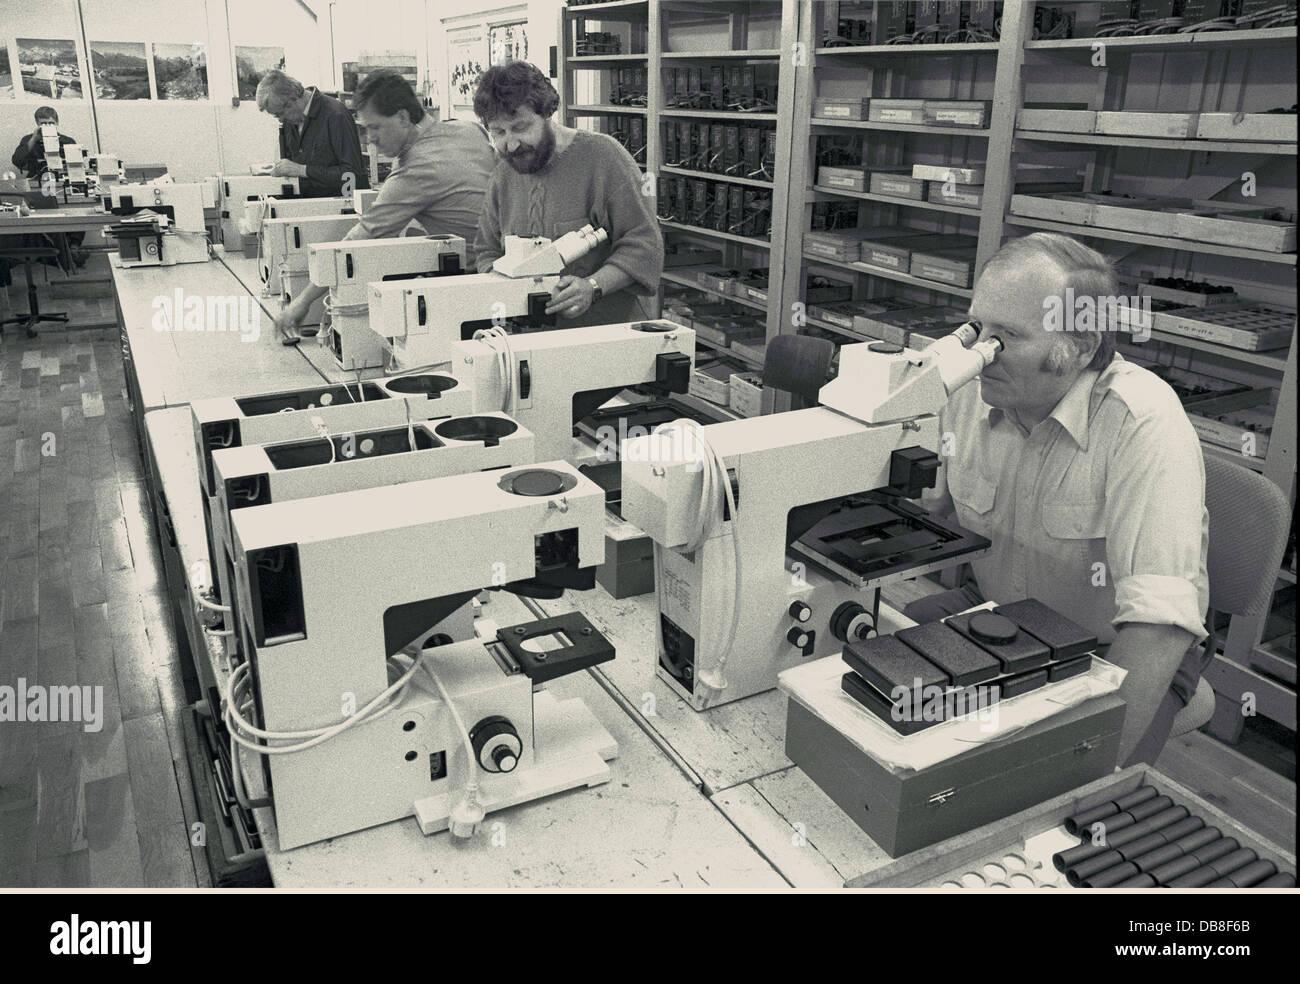 Carl zeiss jena eduval mikroskop microscope mit okularen und